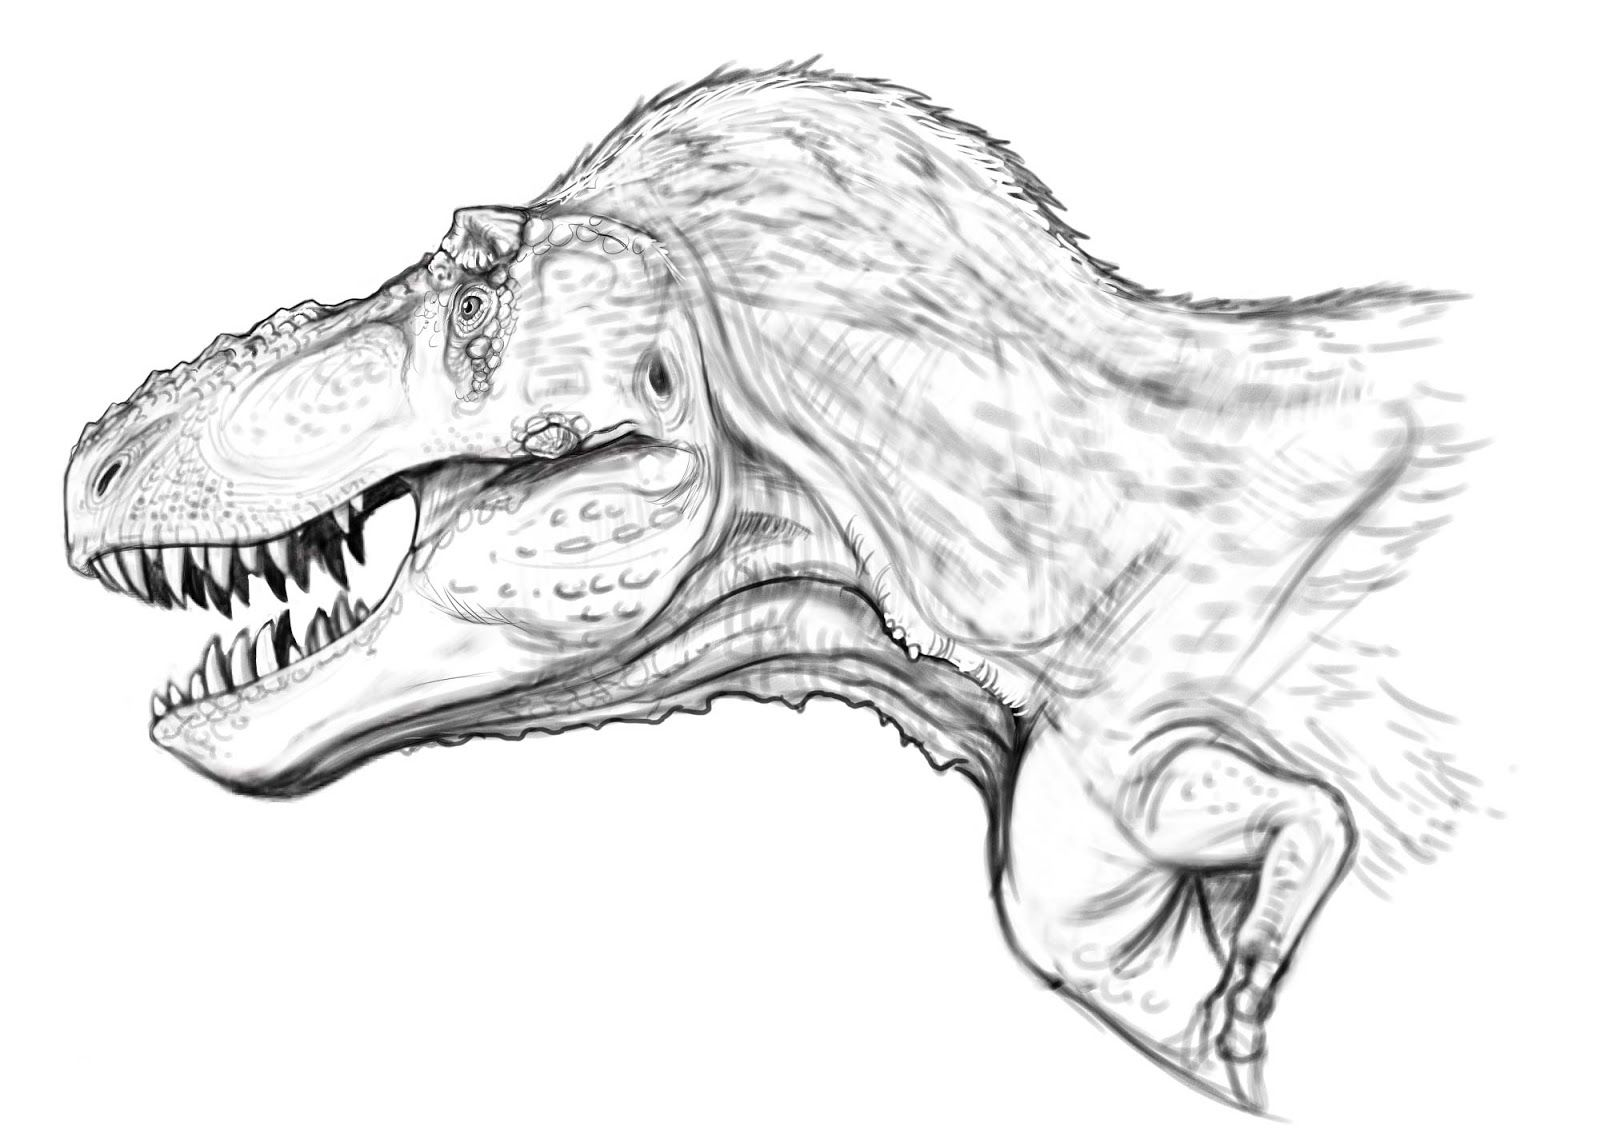 Tyrannosaurus Rex Head Study By Raul A Ramos